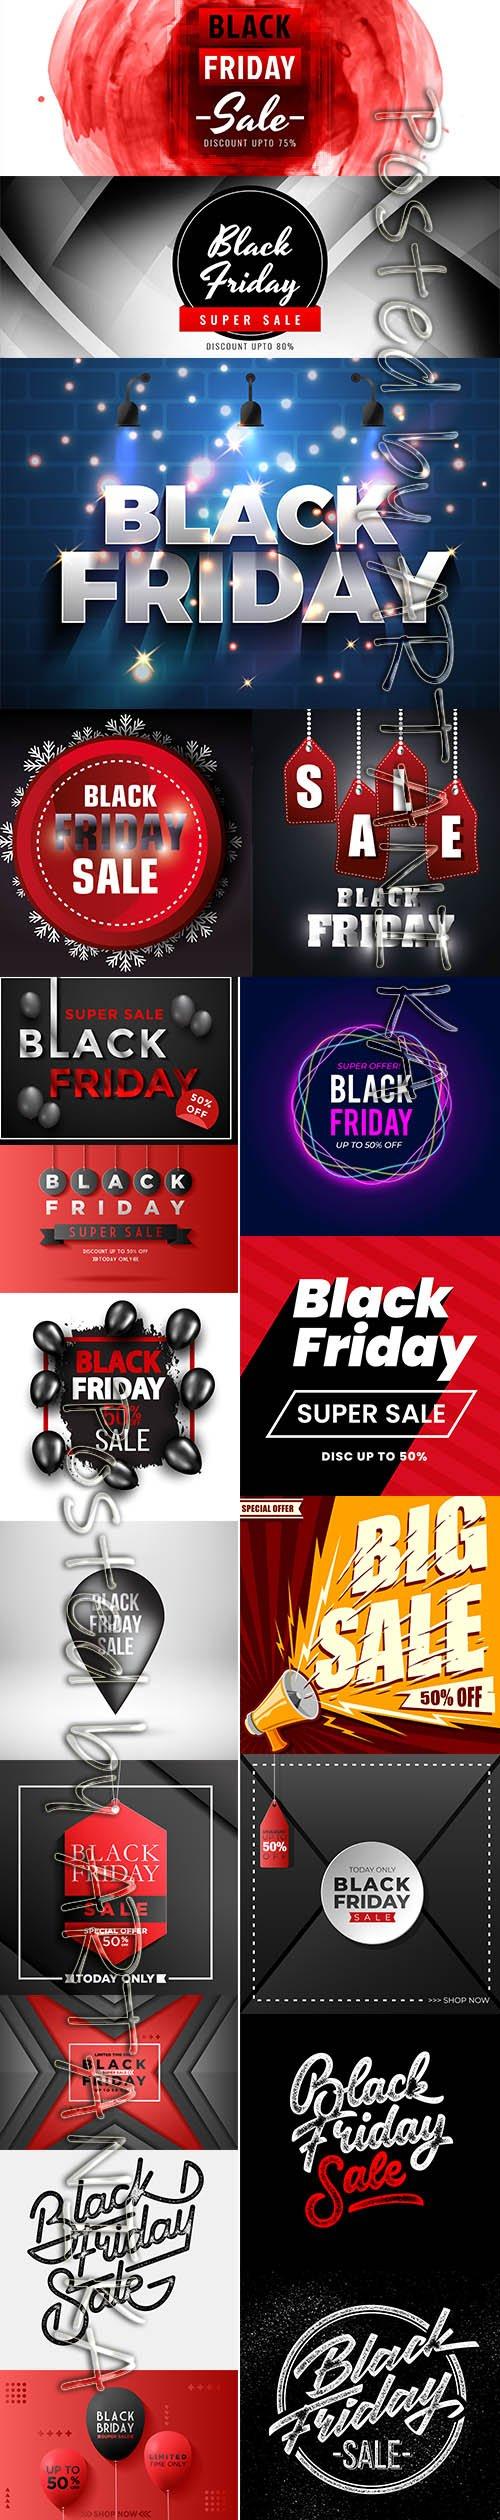 Black Friday Sale Backgrounds